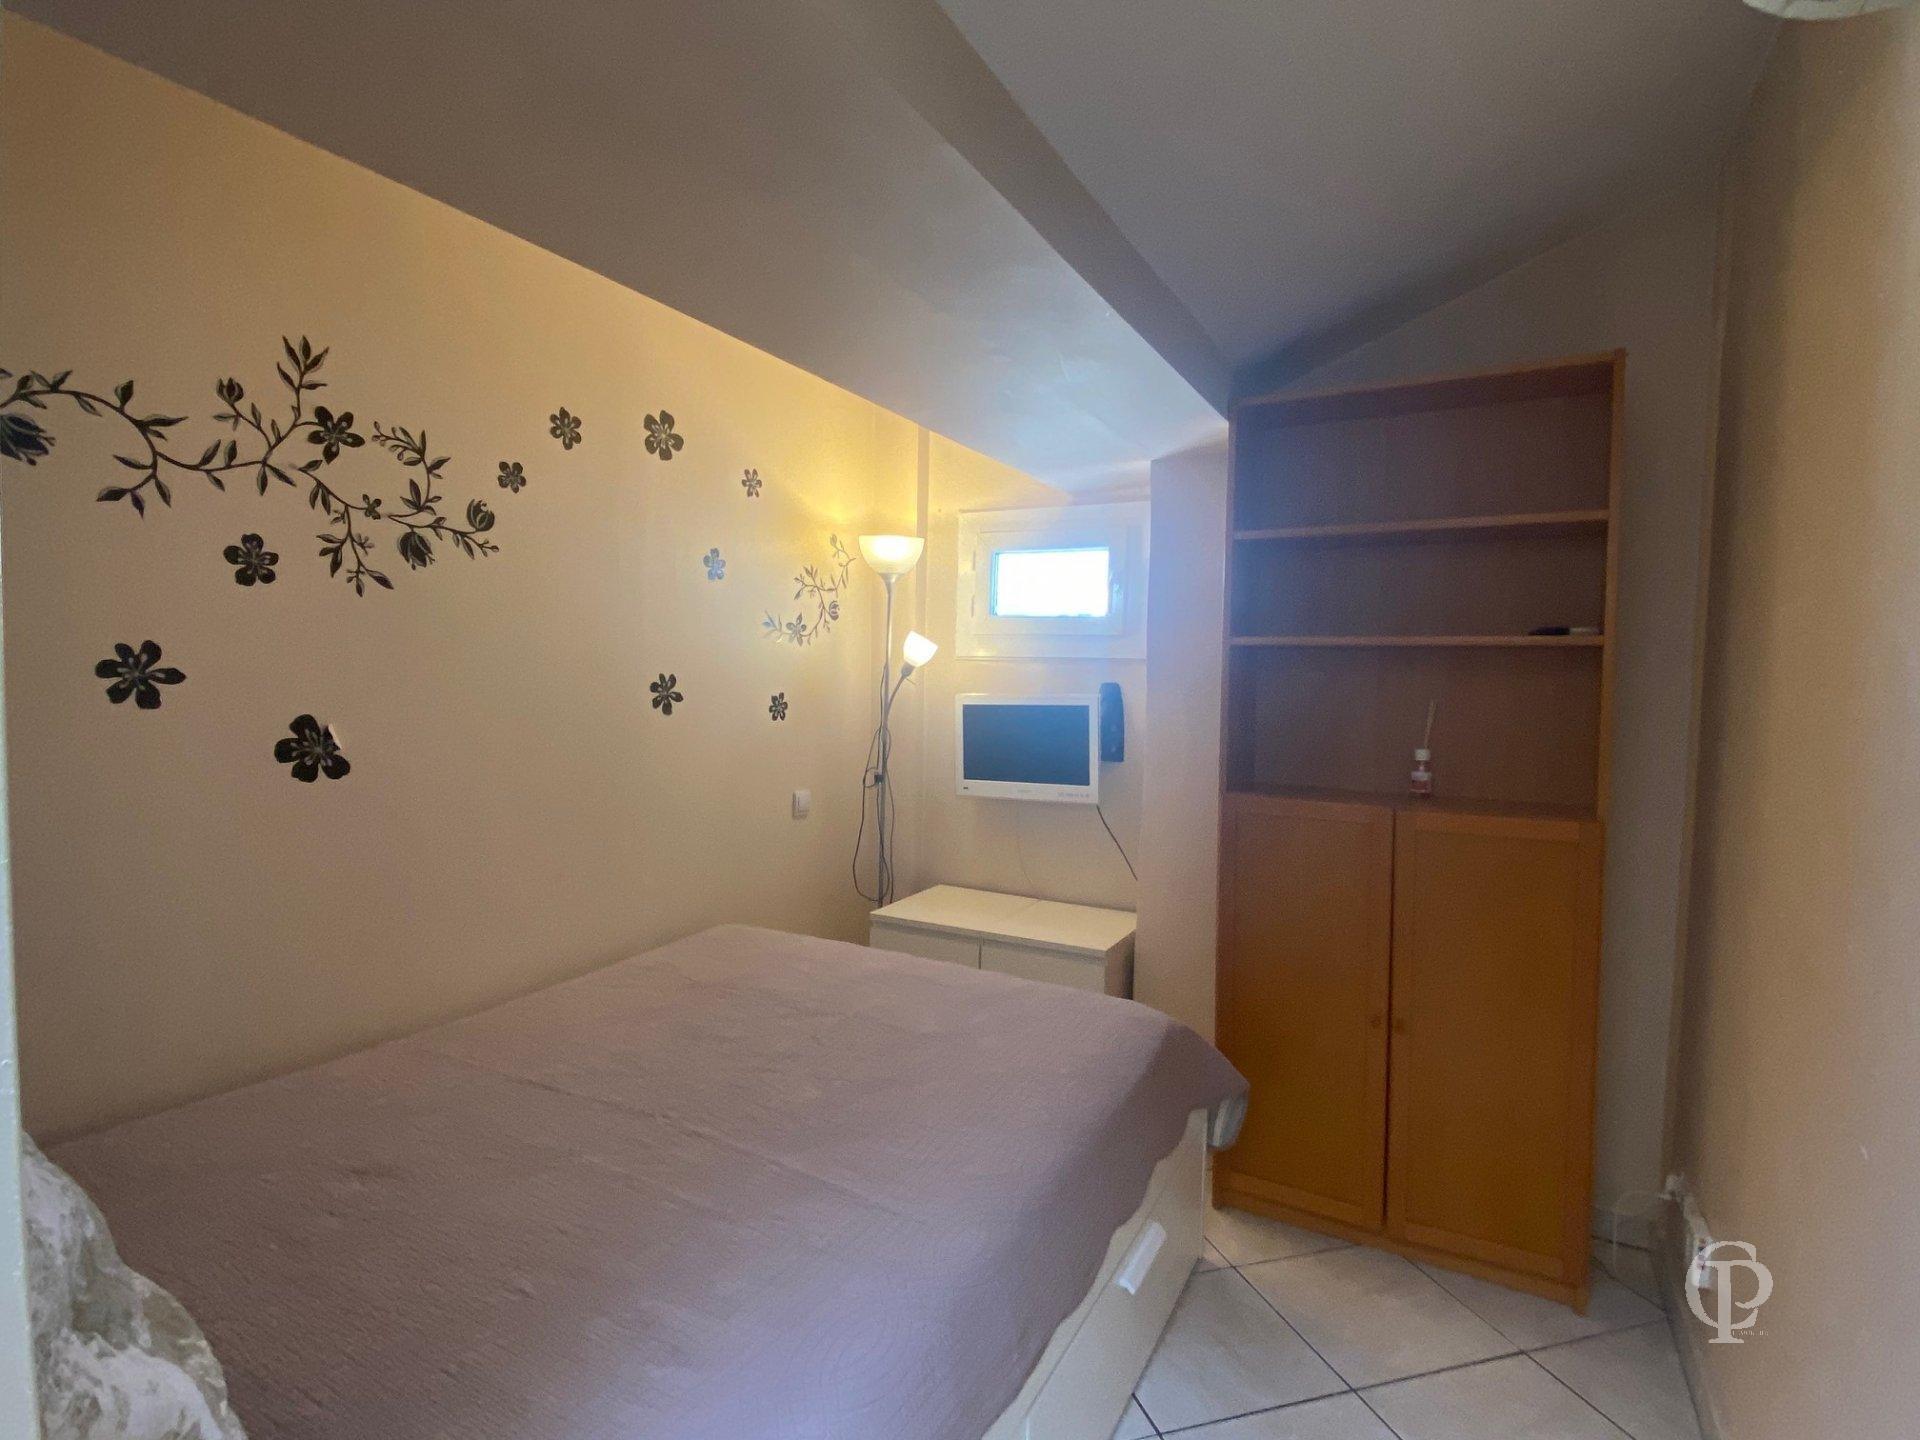 1 BEDROOM NICE CARRE D OR